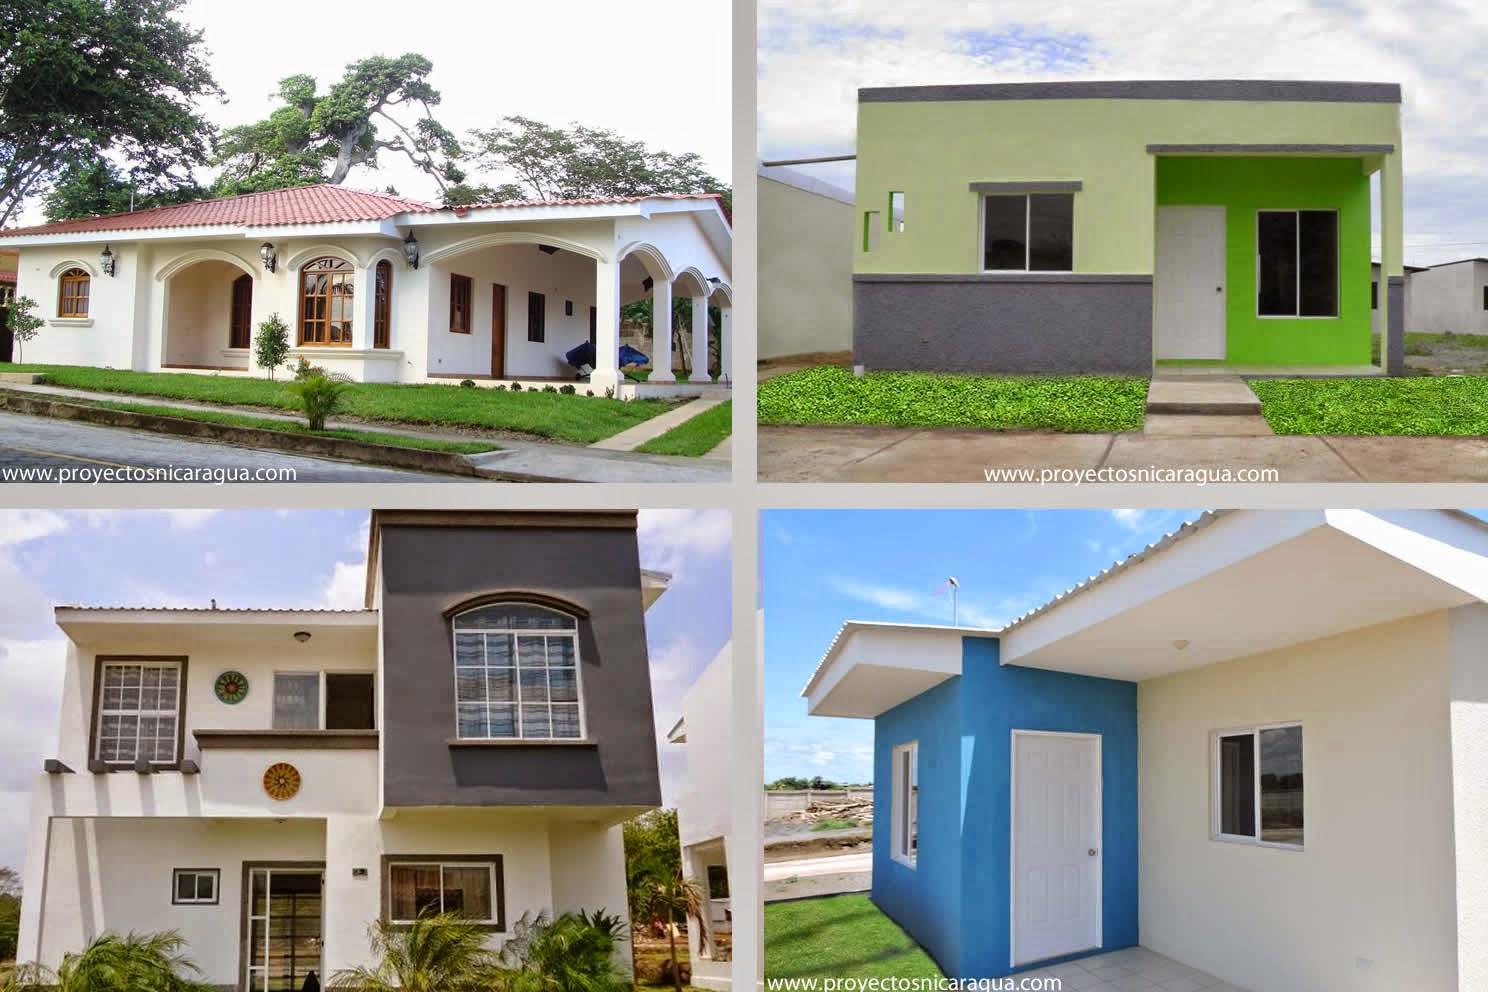 Seguros de casas en nicaragua nuevos proyectos - Seguros para casas ...